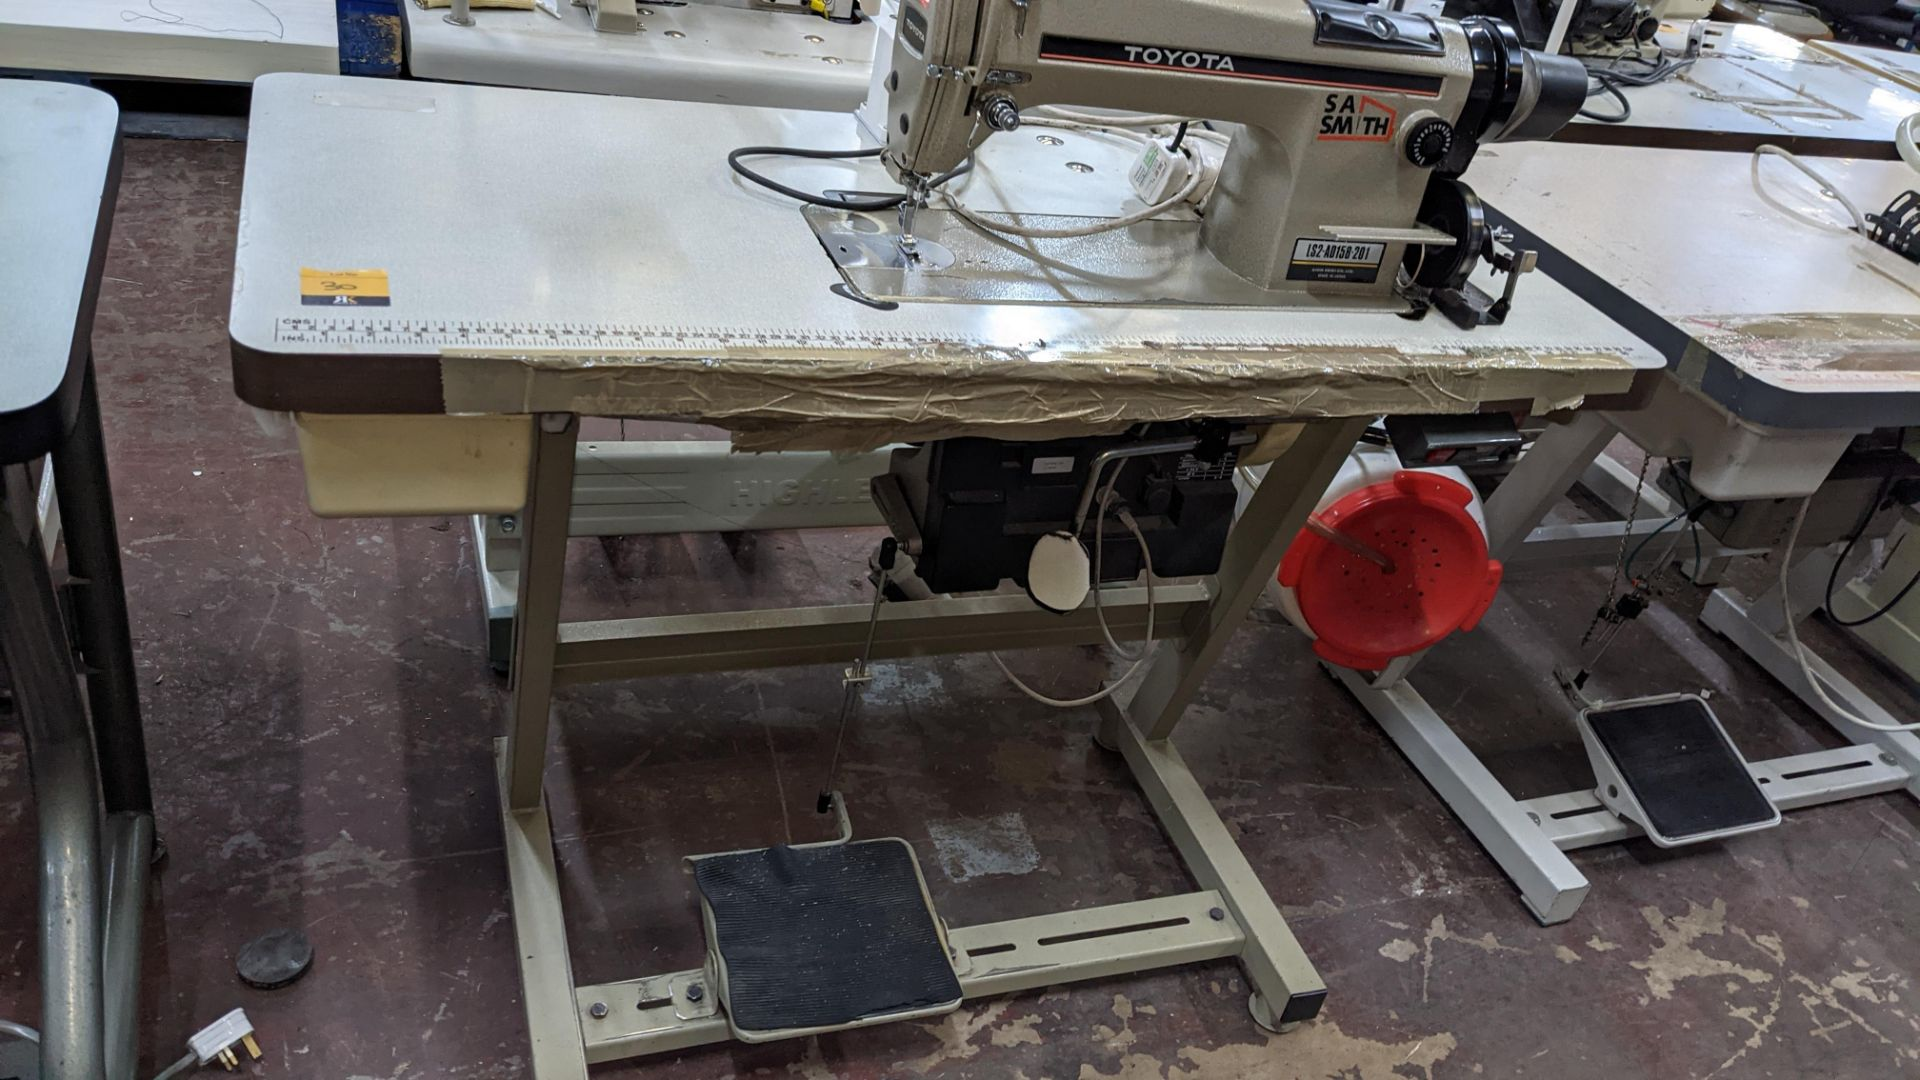 Toyota sewing machine - Image 13 of 17